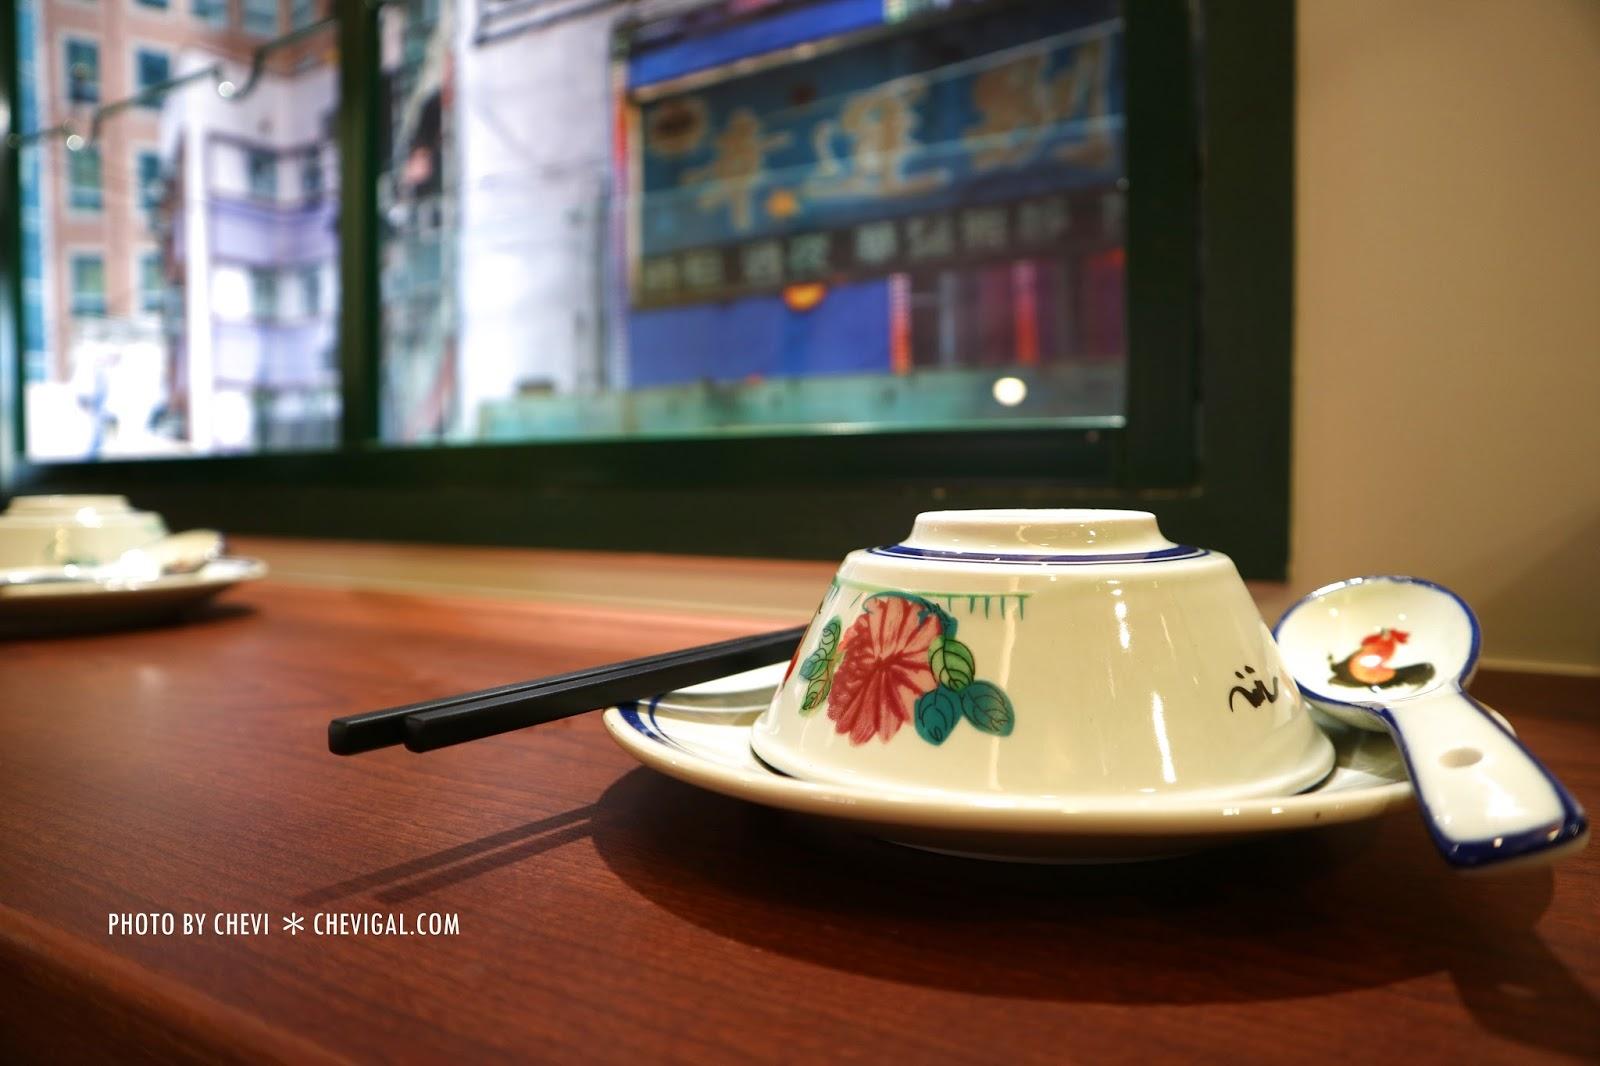 IMG 9112 - 台中西屯│帥鍋冰室*台中第一間香港冰室新開幕。道地港式餐點風味搬來台灣囉